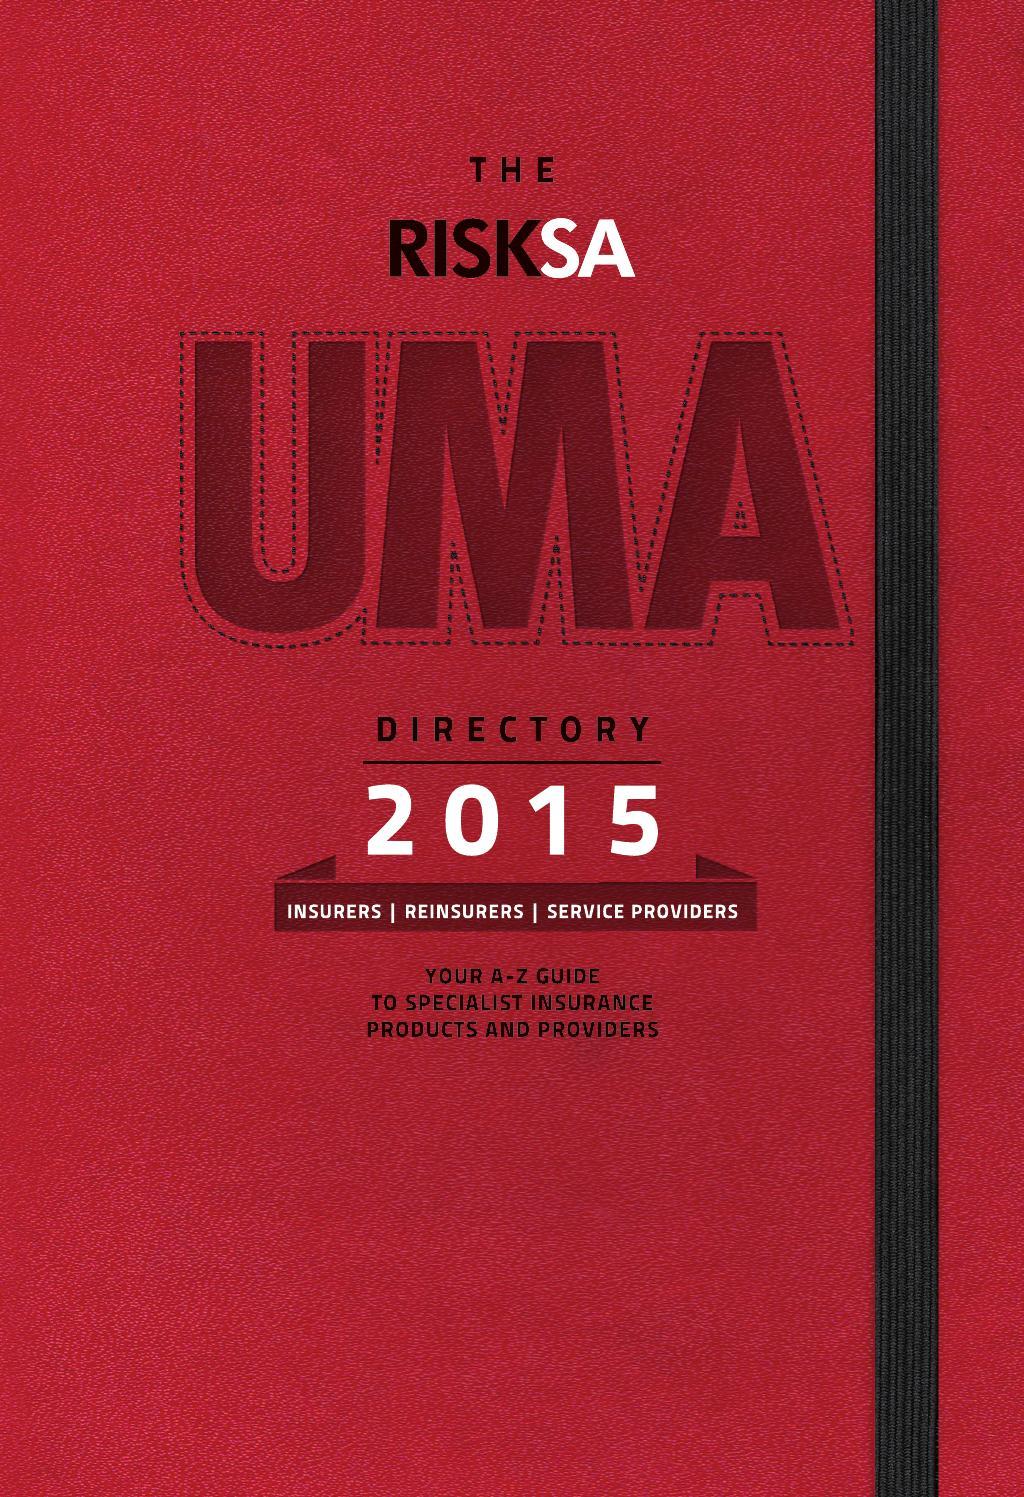 RISKSA UMA Directory 2015 by COSA Media - issuu